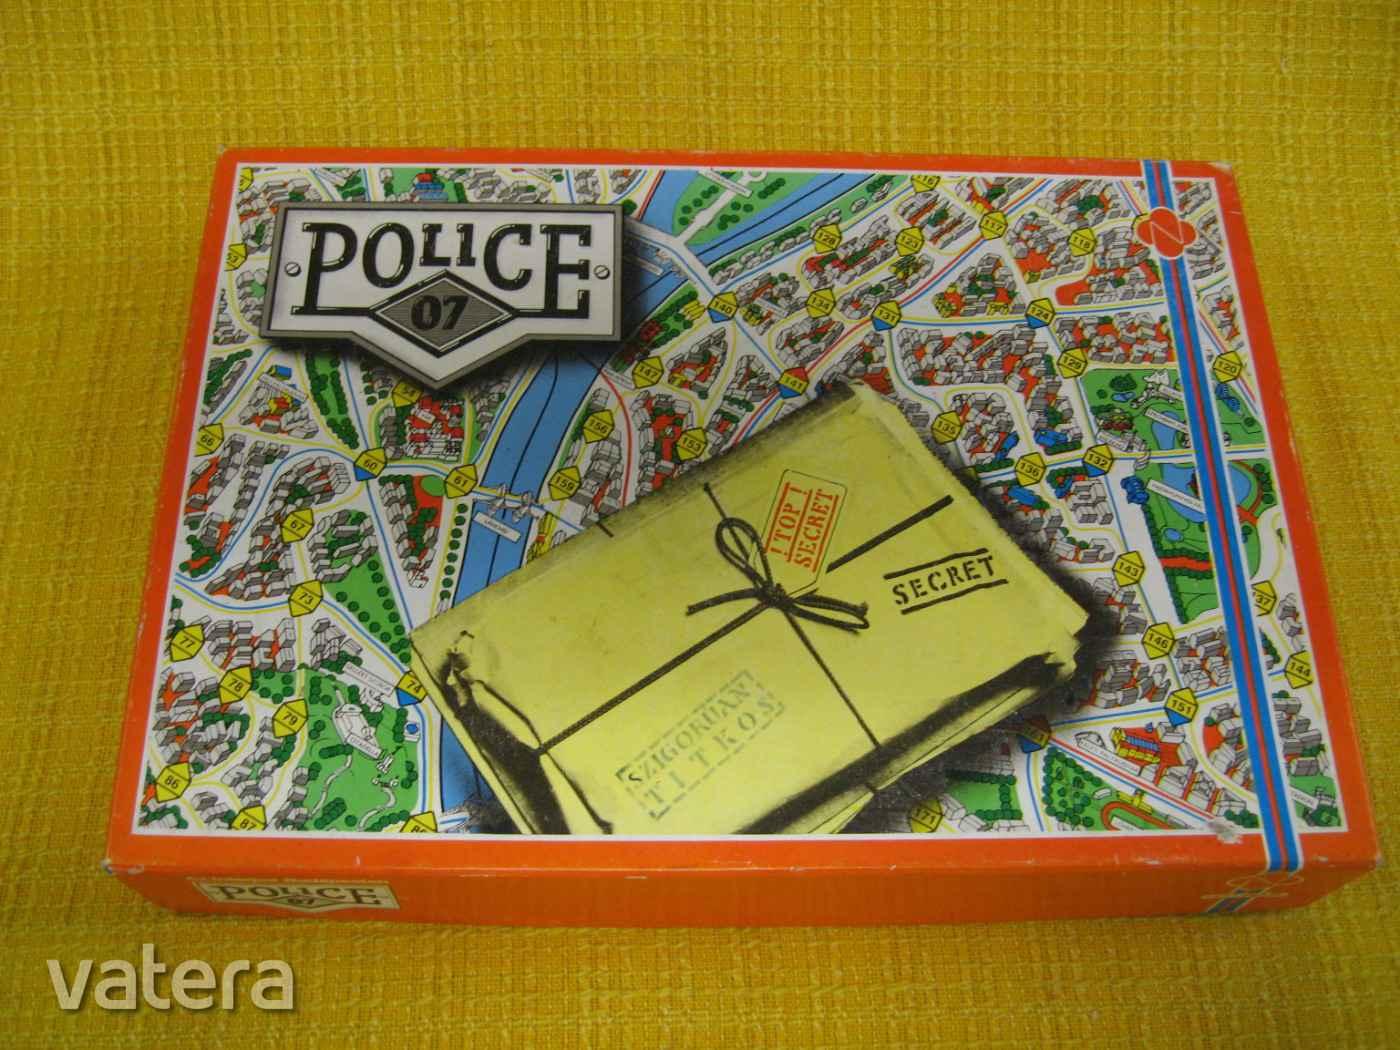 novoplast-police-07-regi-retro-tarsasjatek-ad9a_1_big.jpg